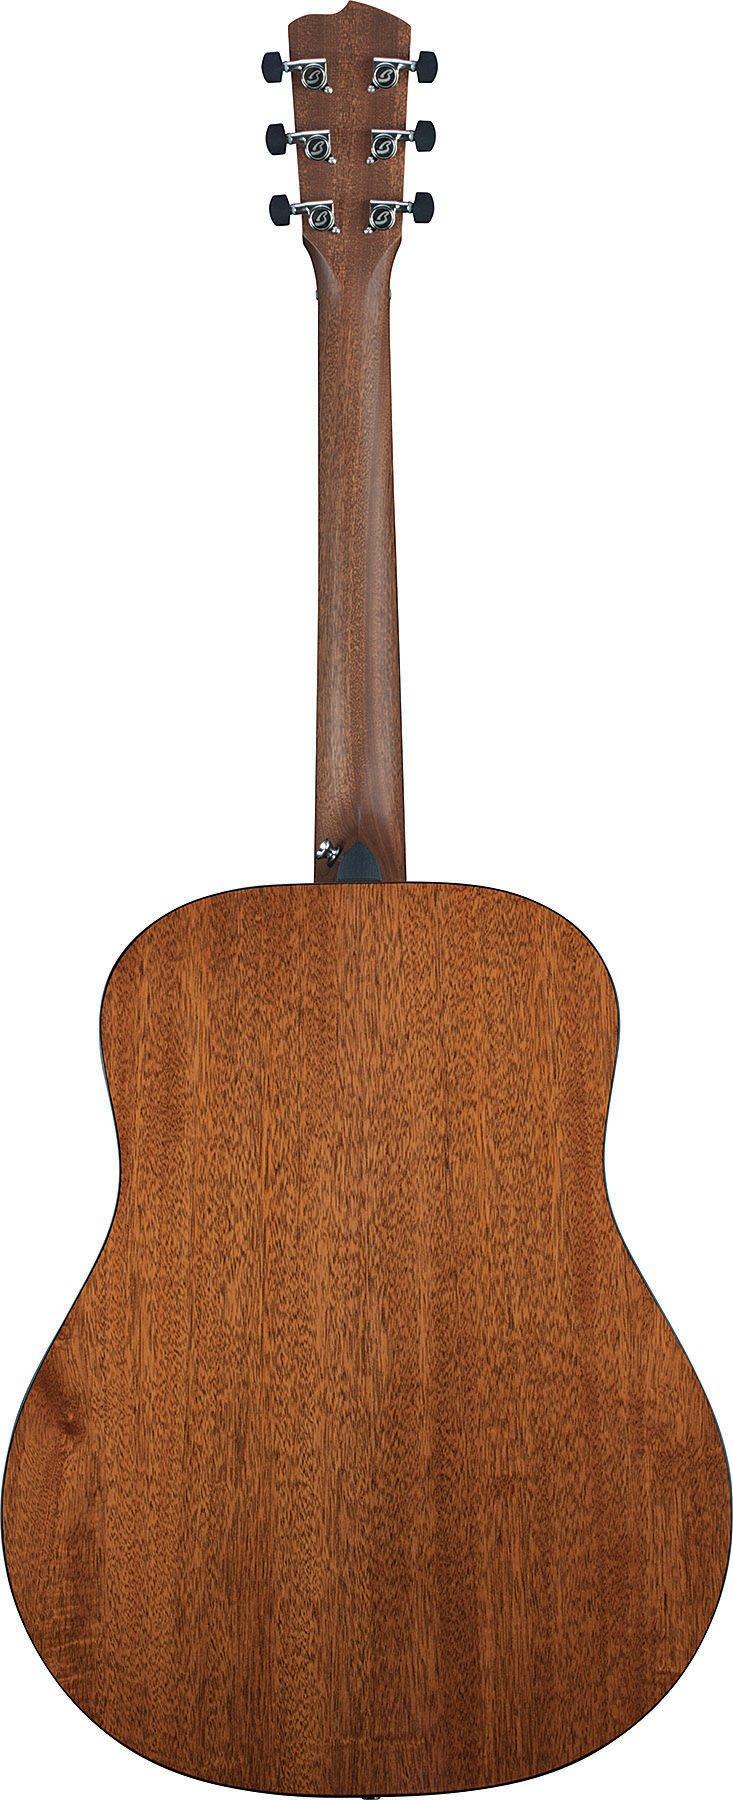 Acoustic-Electric Dreadnought Guitar